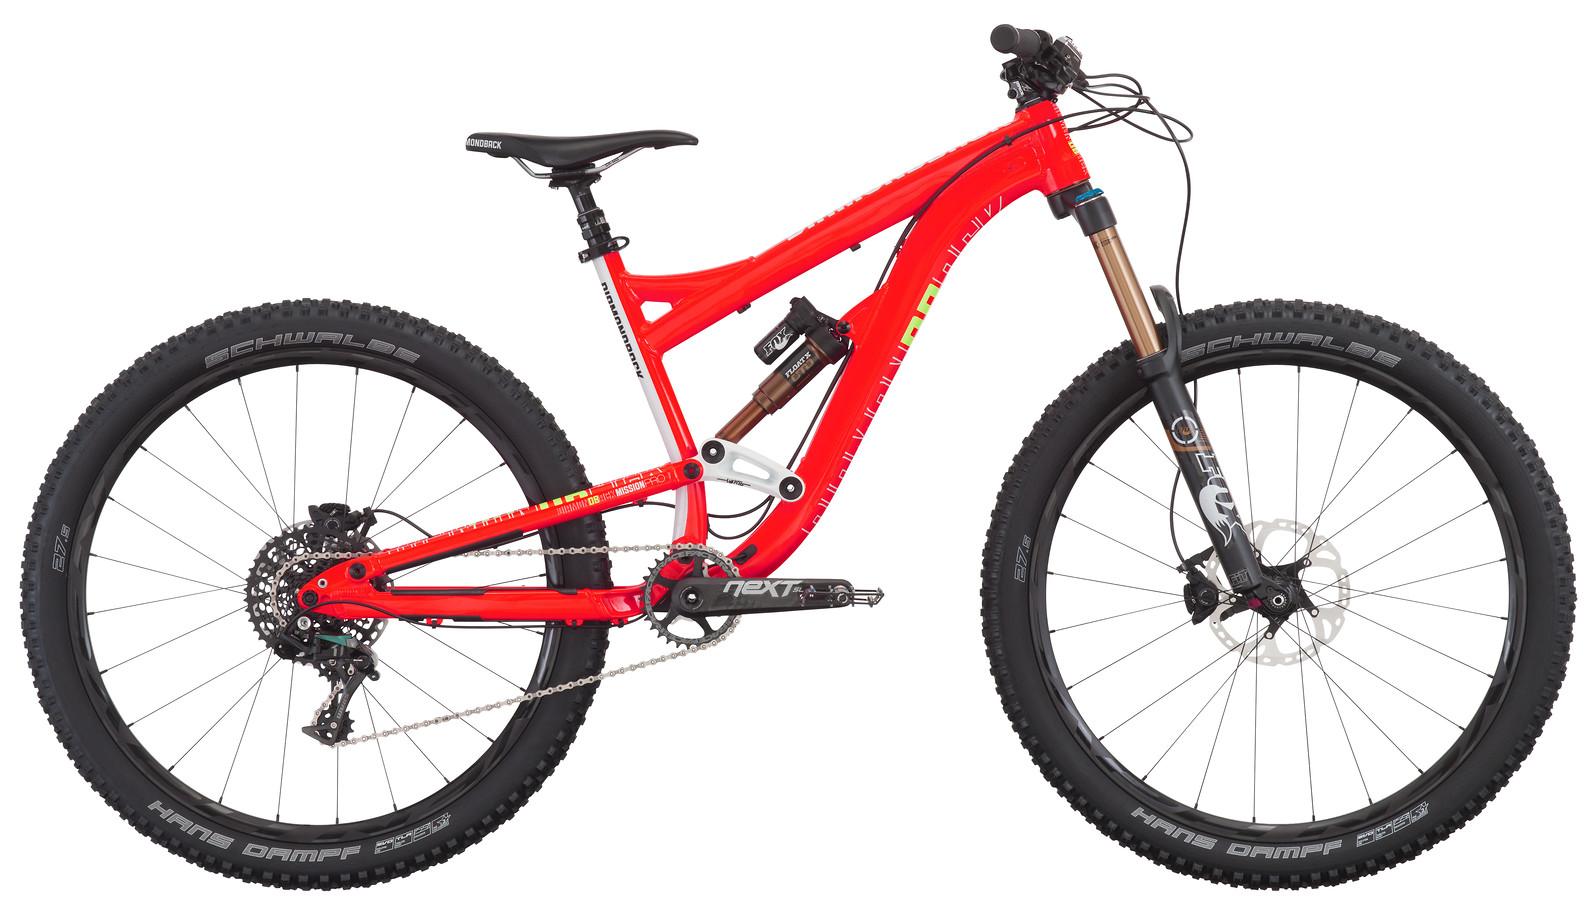 2015 Diamondback Mission Pro 27.5 Bike